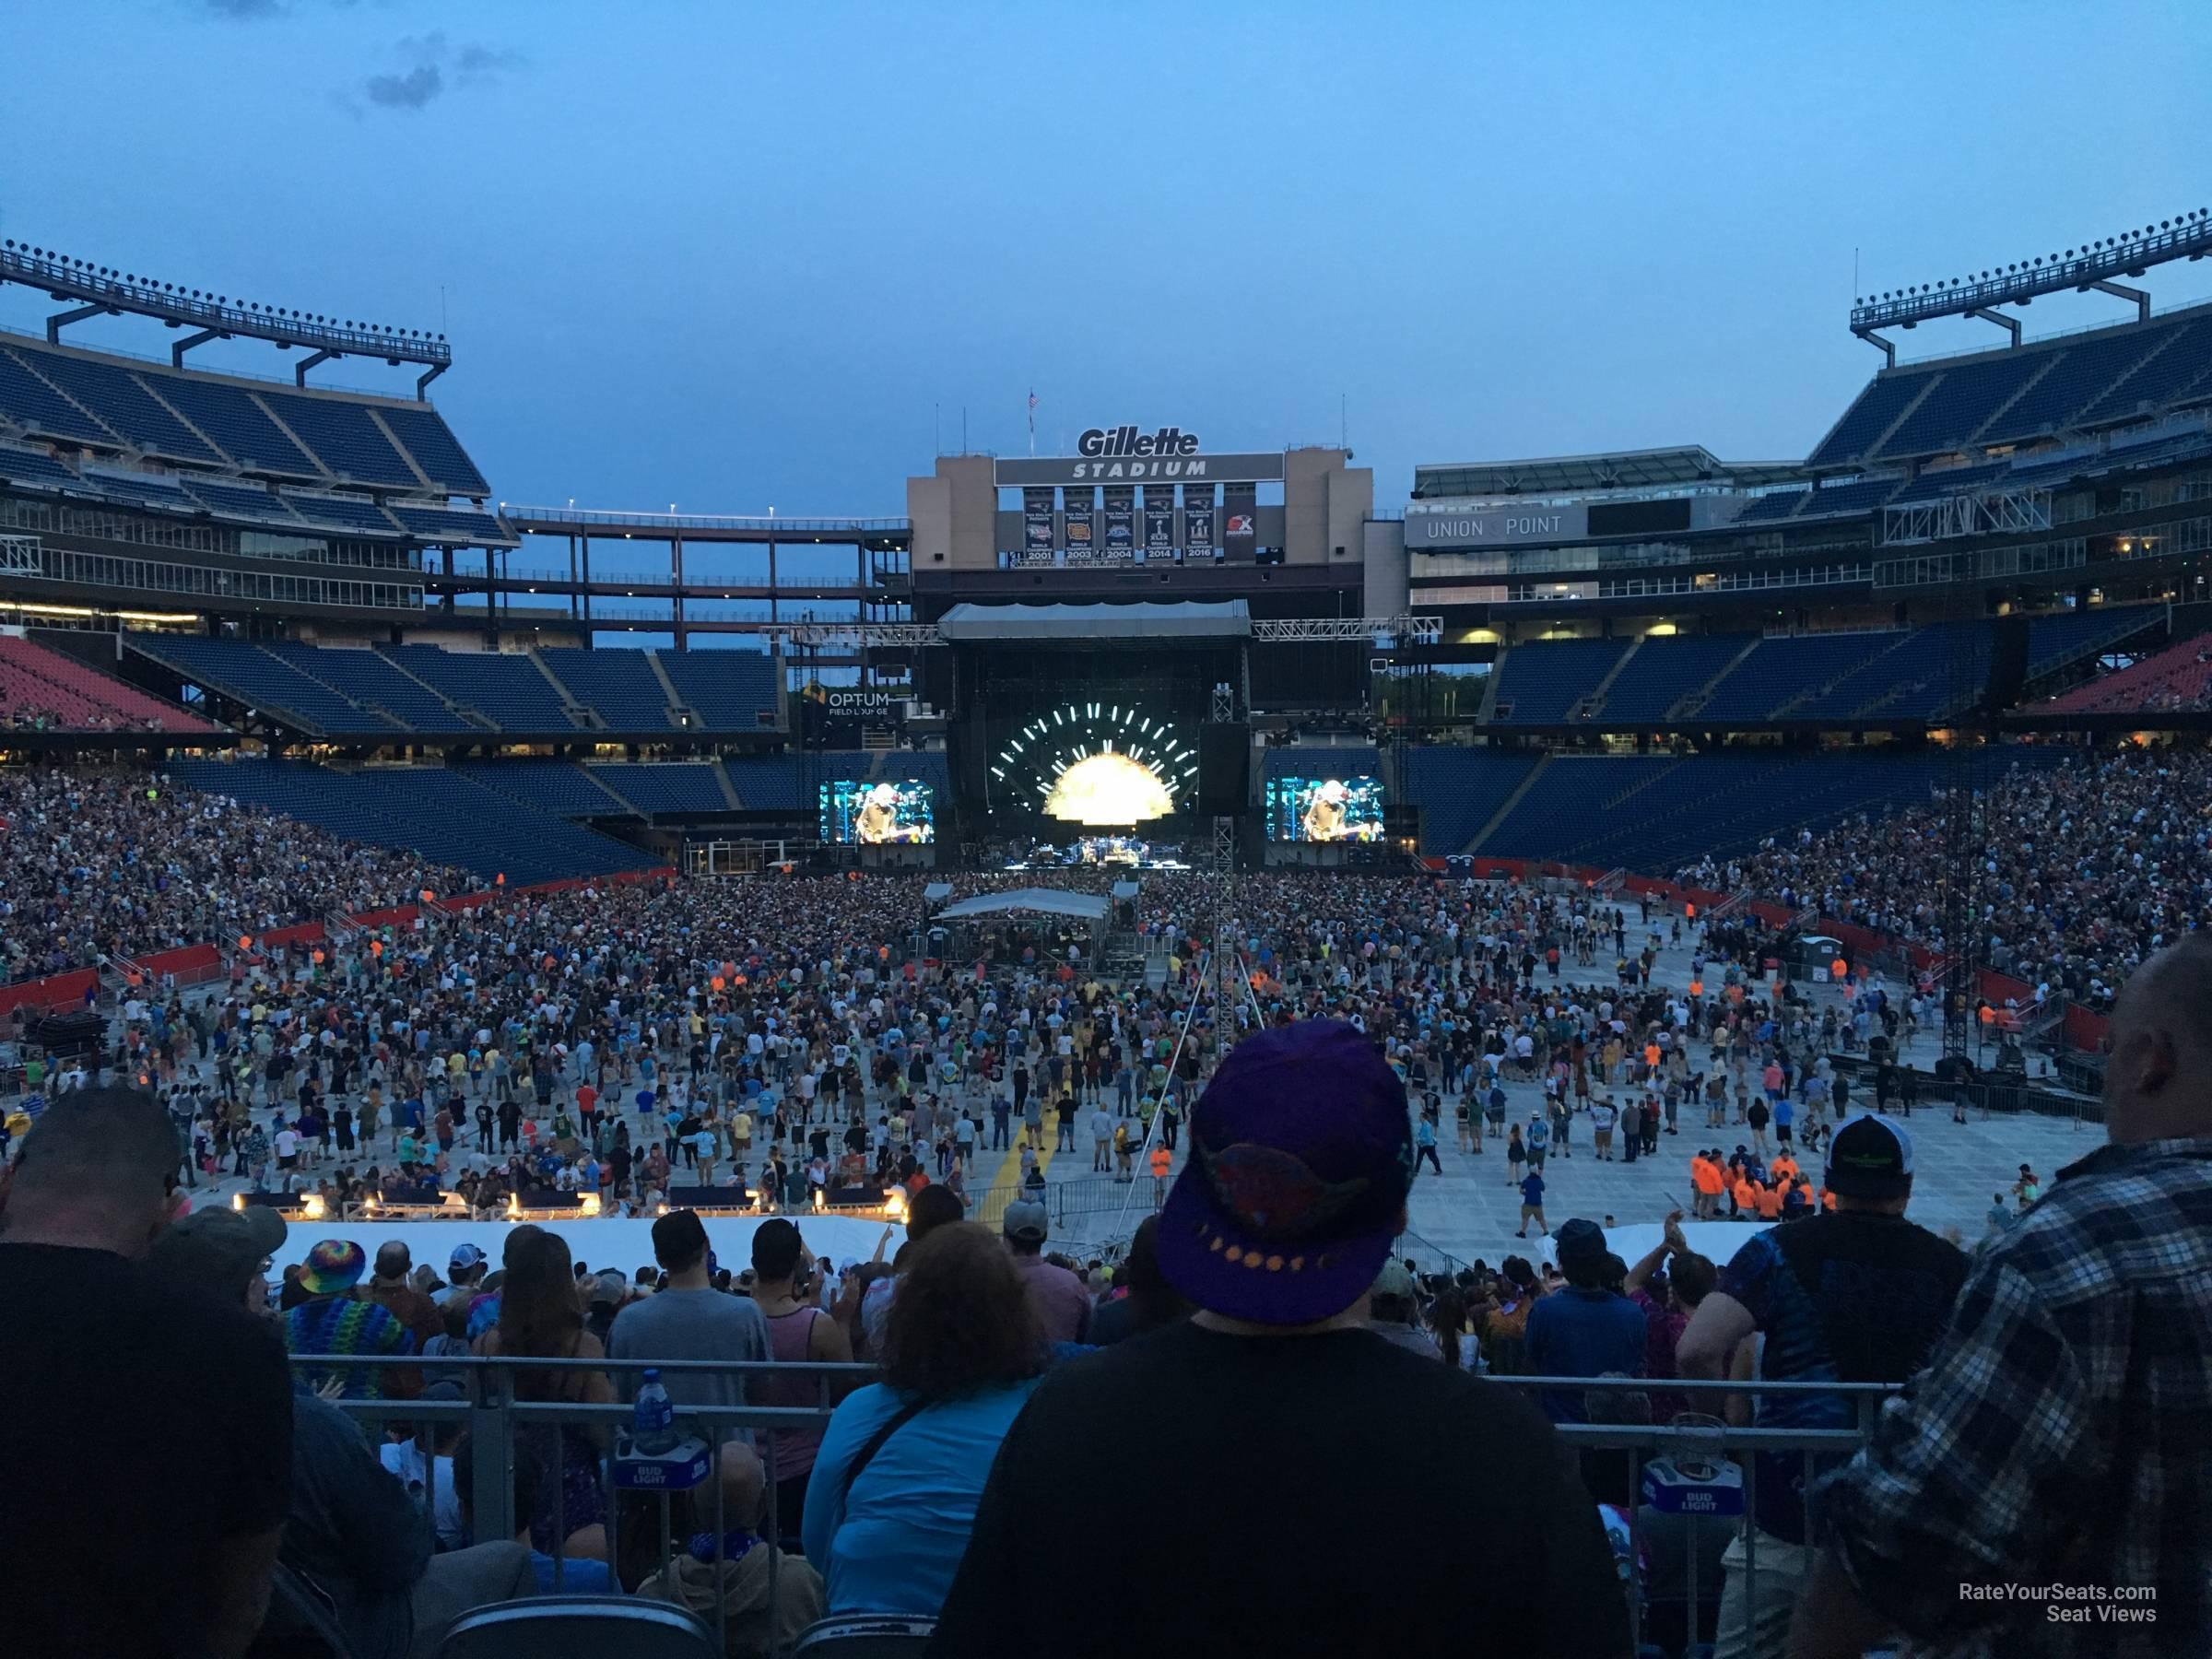 Gillette Stadium Concert Seating Guide - RateYourSeats com